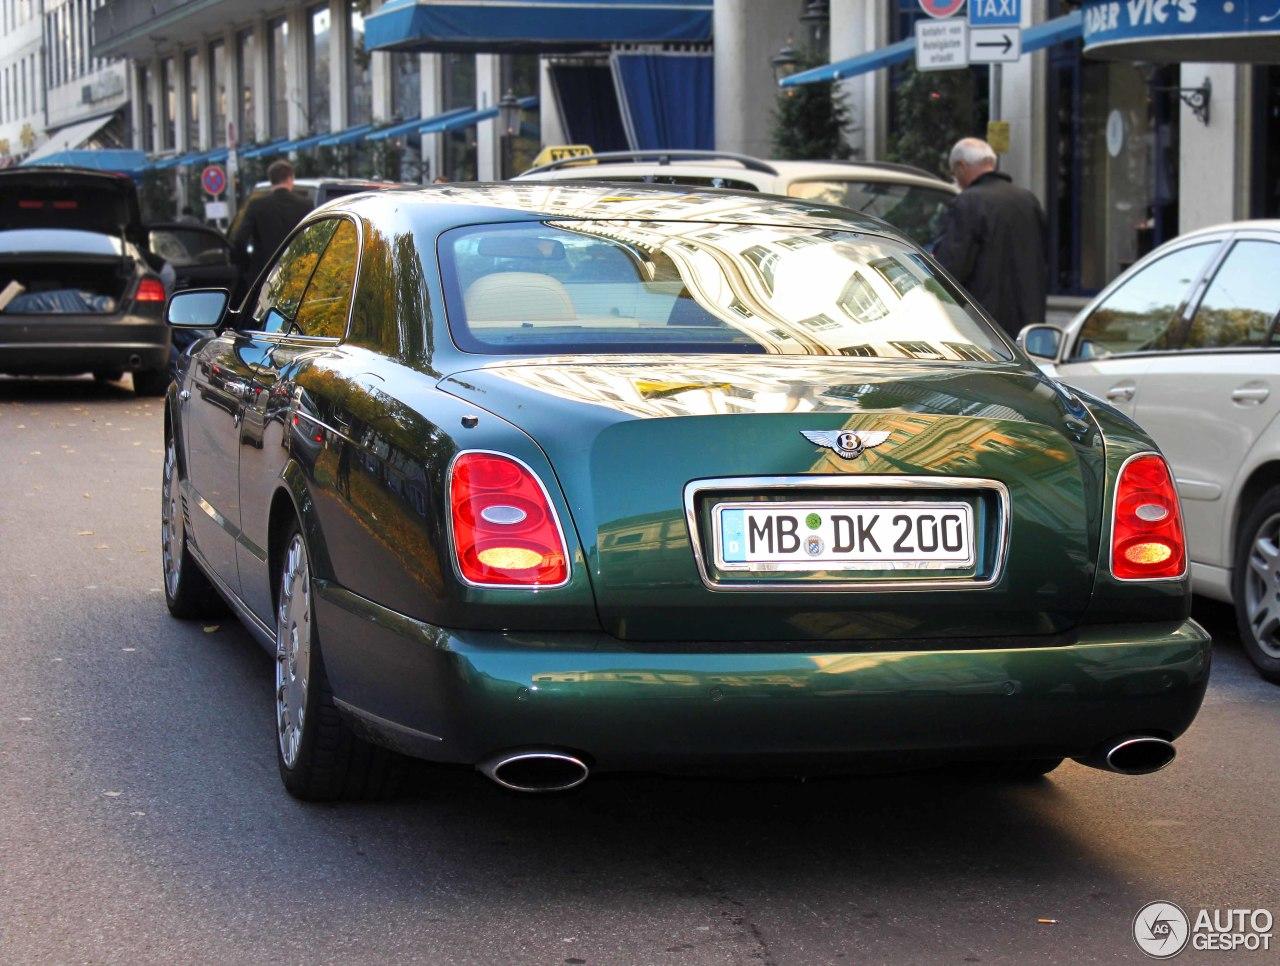 Bentley brooklands 2008 11 january 2015 autogespot 2 i bentley brooklands 2008 2 vanachro Choice Image